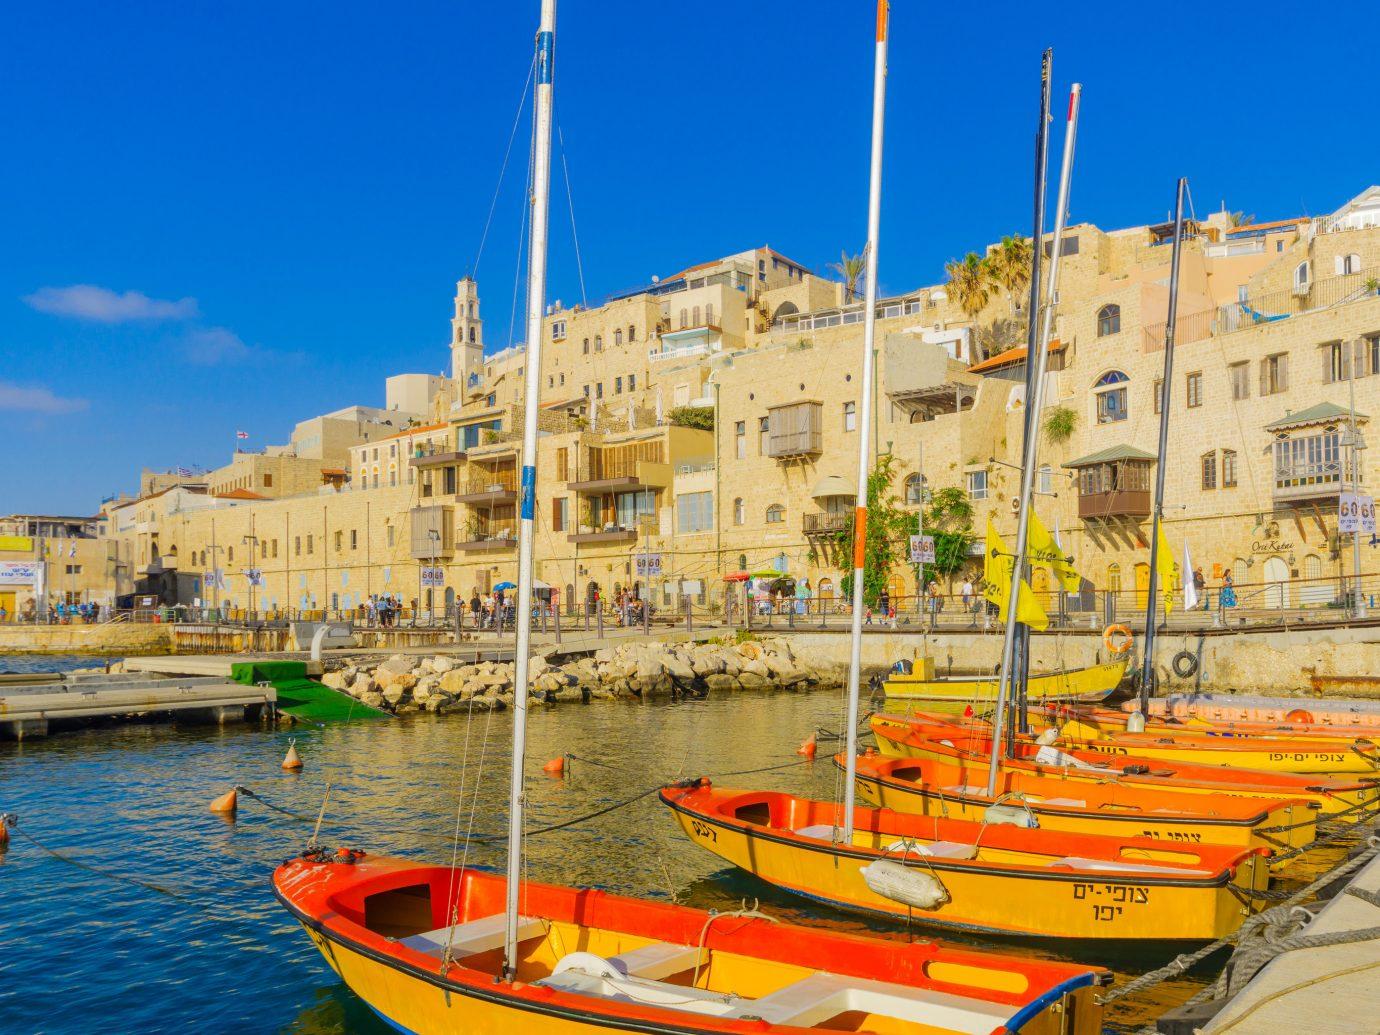 Arts + Culture Trip Ideas Harbor sky Sea port water marina Boat tourism watercraft City Coast channel